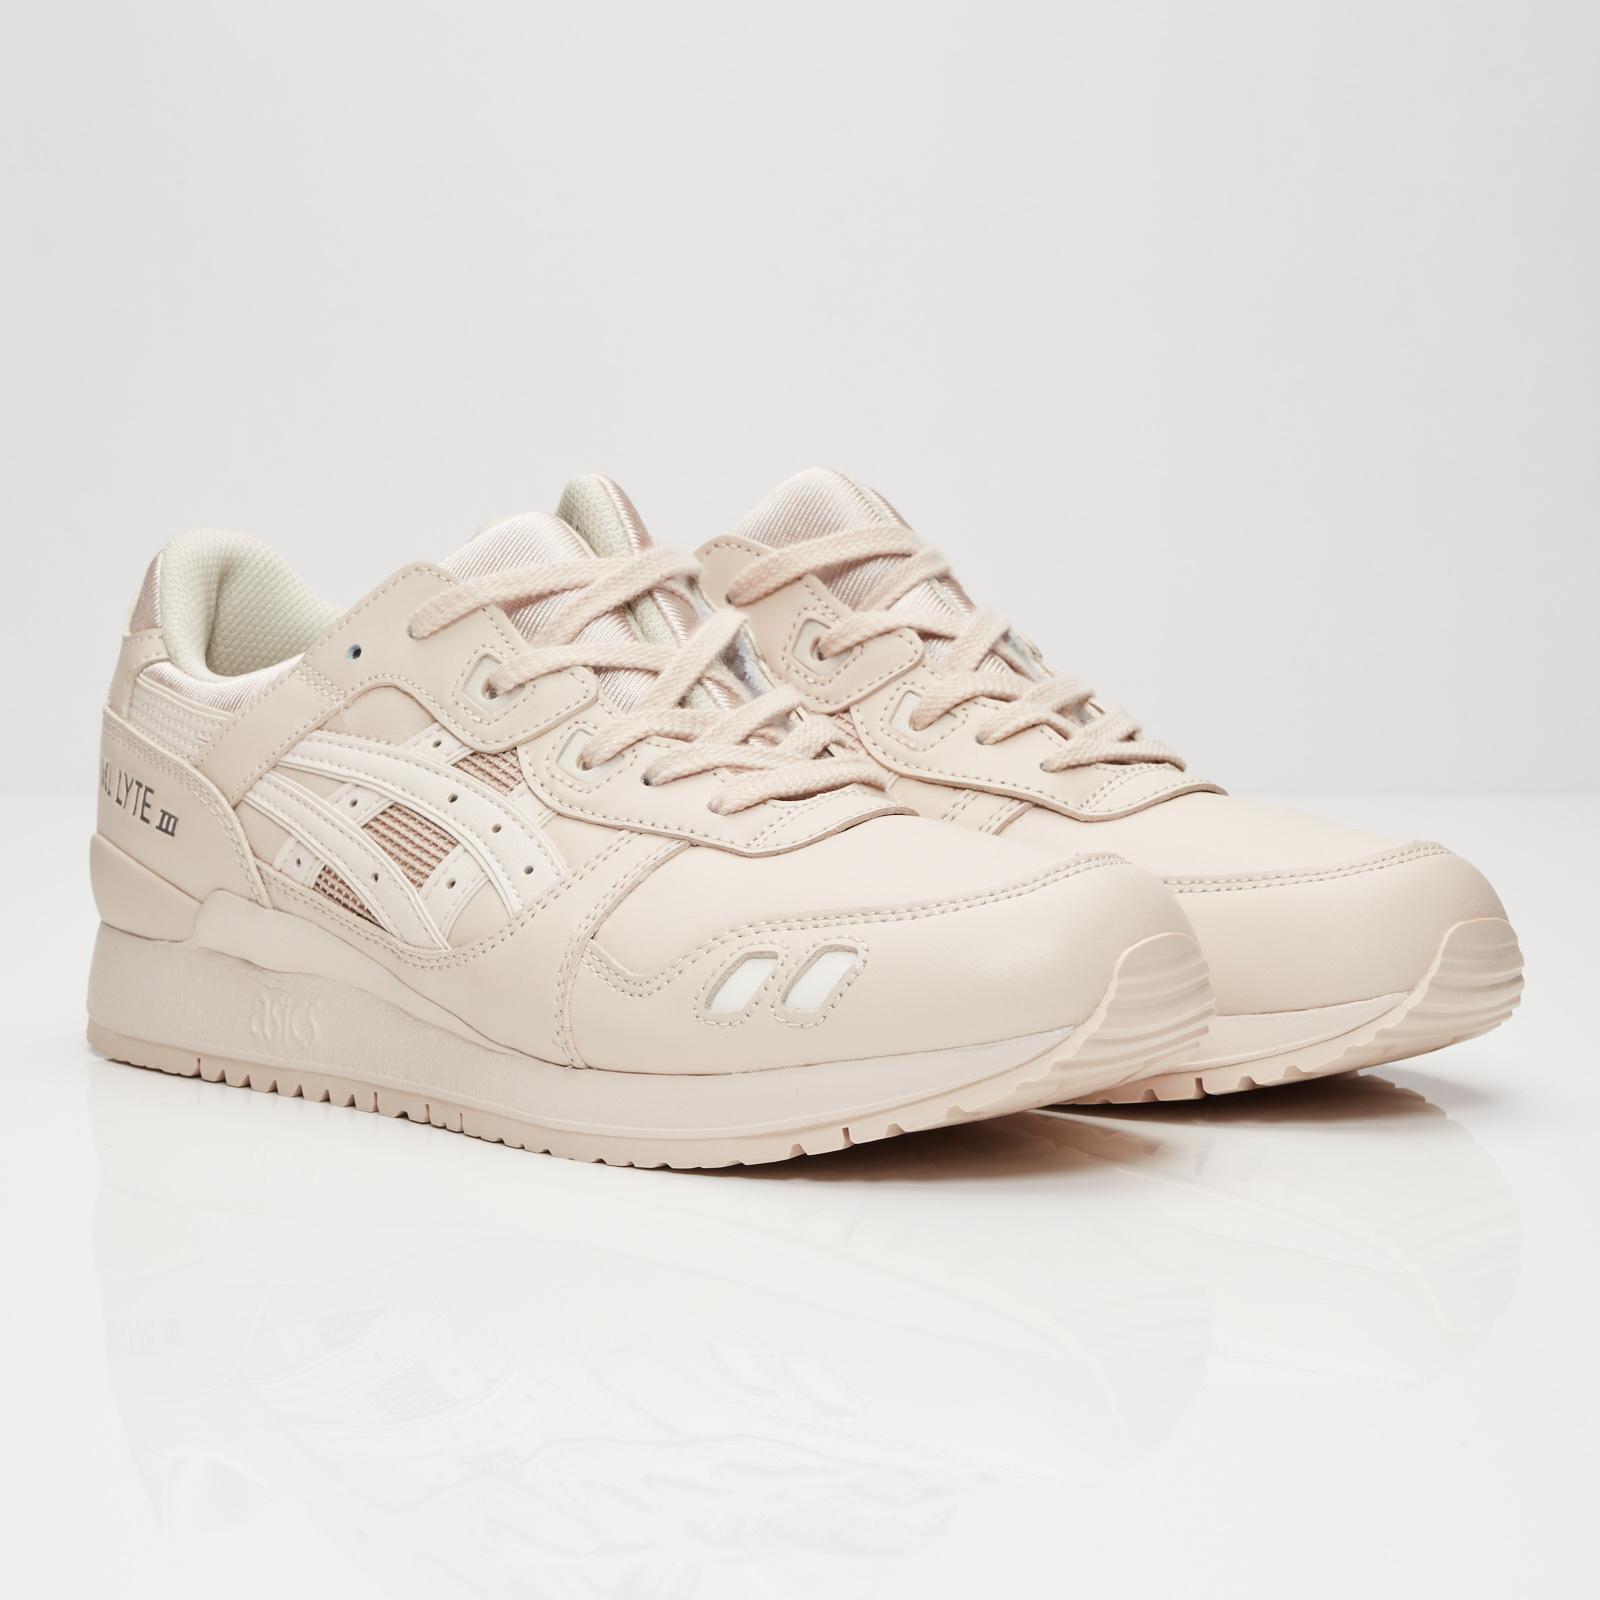 finest selection fc654 8a584 ASICS Tiger Gel-Lyte III - Hl6a2-2121 - Sneakersnstuff ...